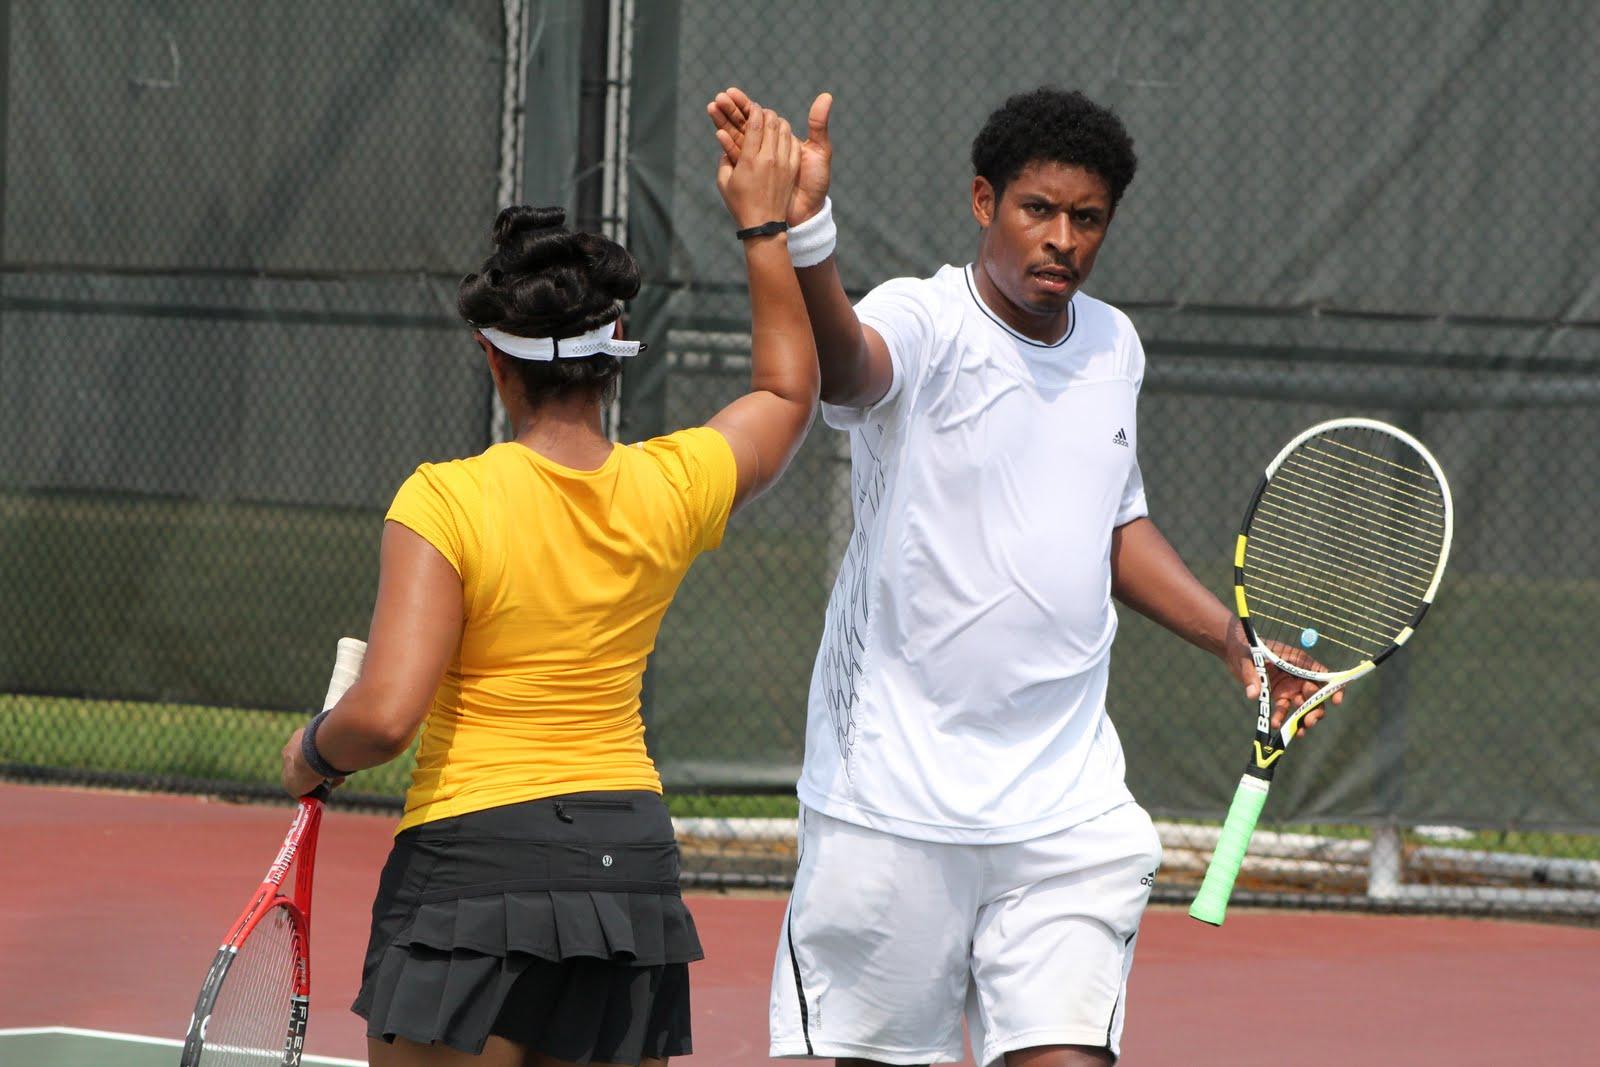 Kelyn's Tennis Blog: Mid-Atlantic Mixed Doubles Sectional Teams